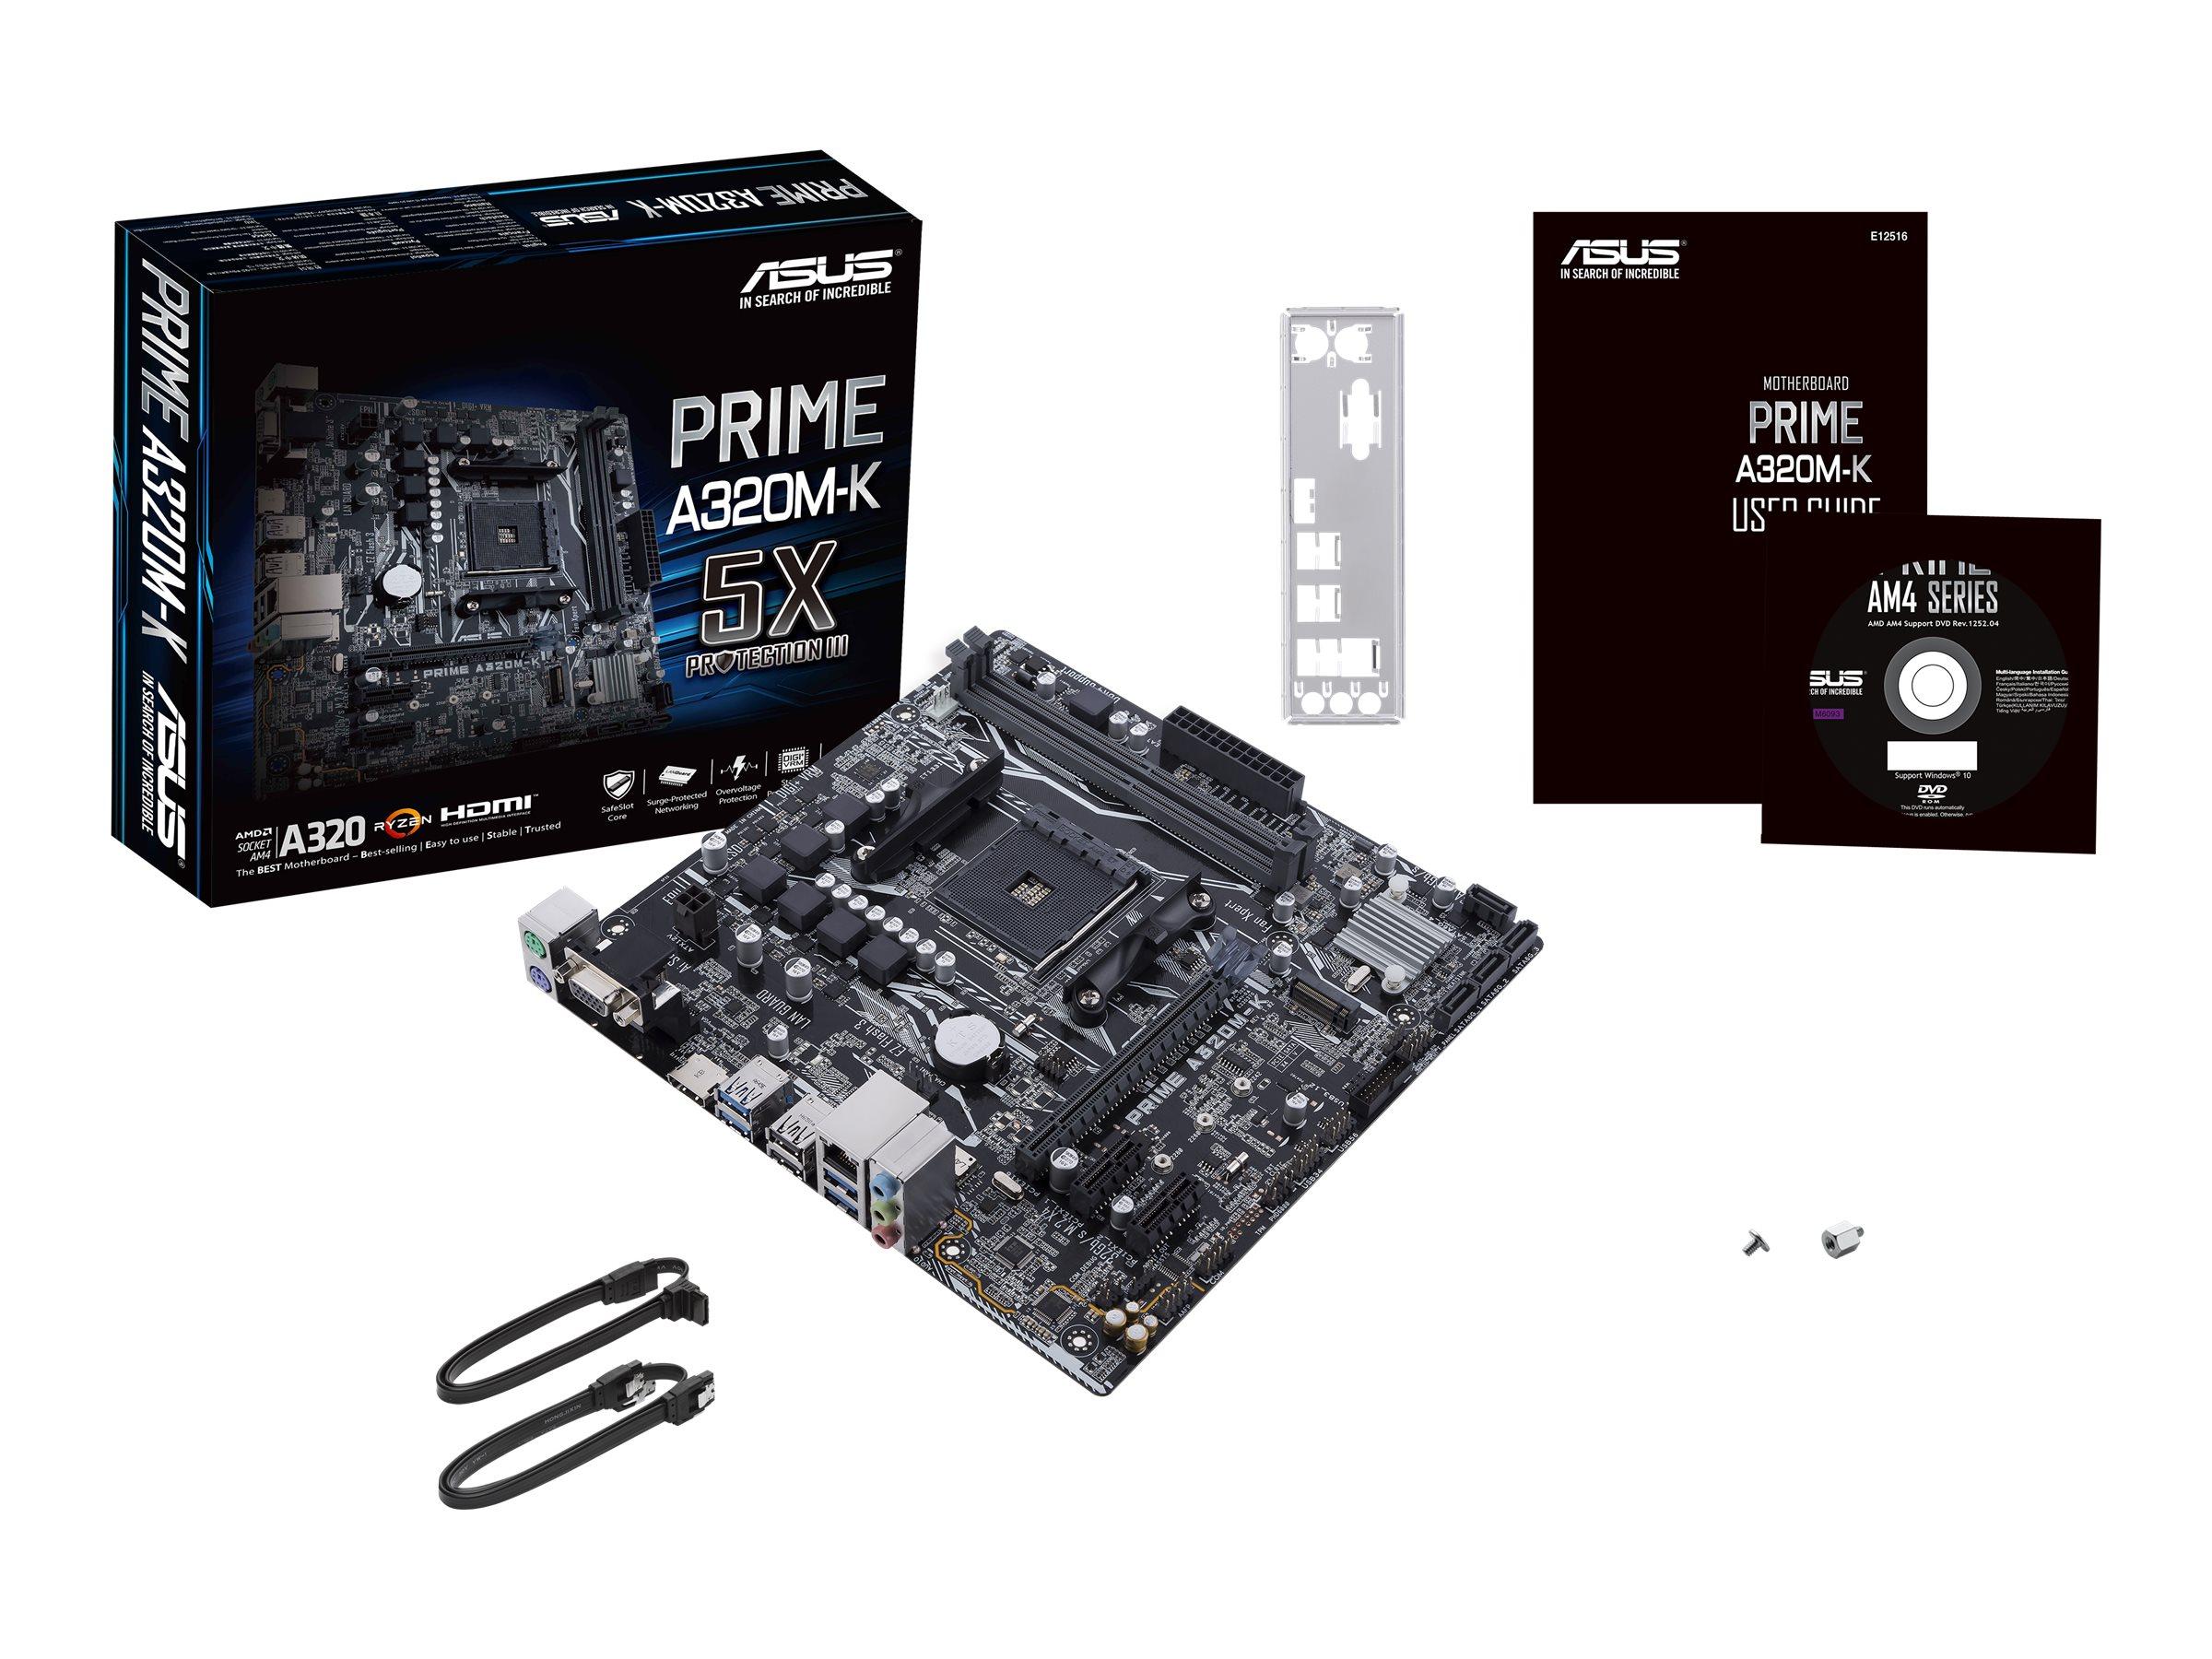 ASUS PRIME A320M-K - Motherboard - micro ATX - Socket AM4 - AMD A320 - USB 3.0 - Gigabit LAN - Onboard-Grafik (CPU erforderlich)